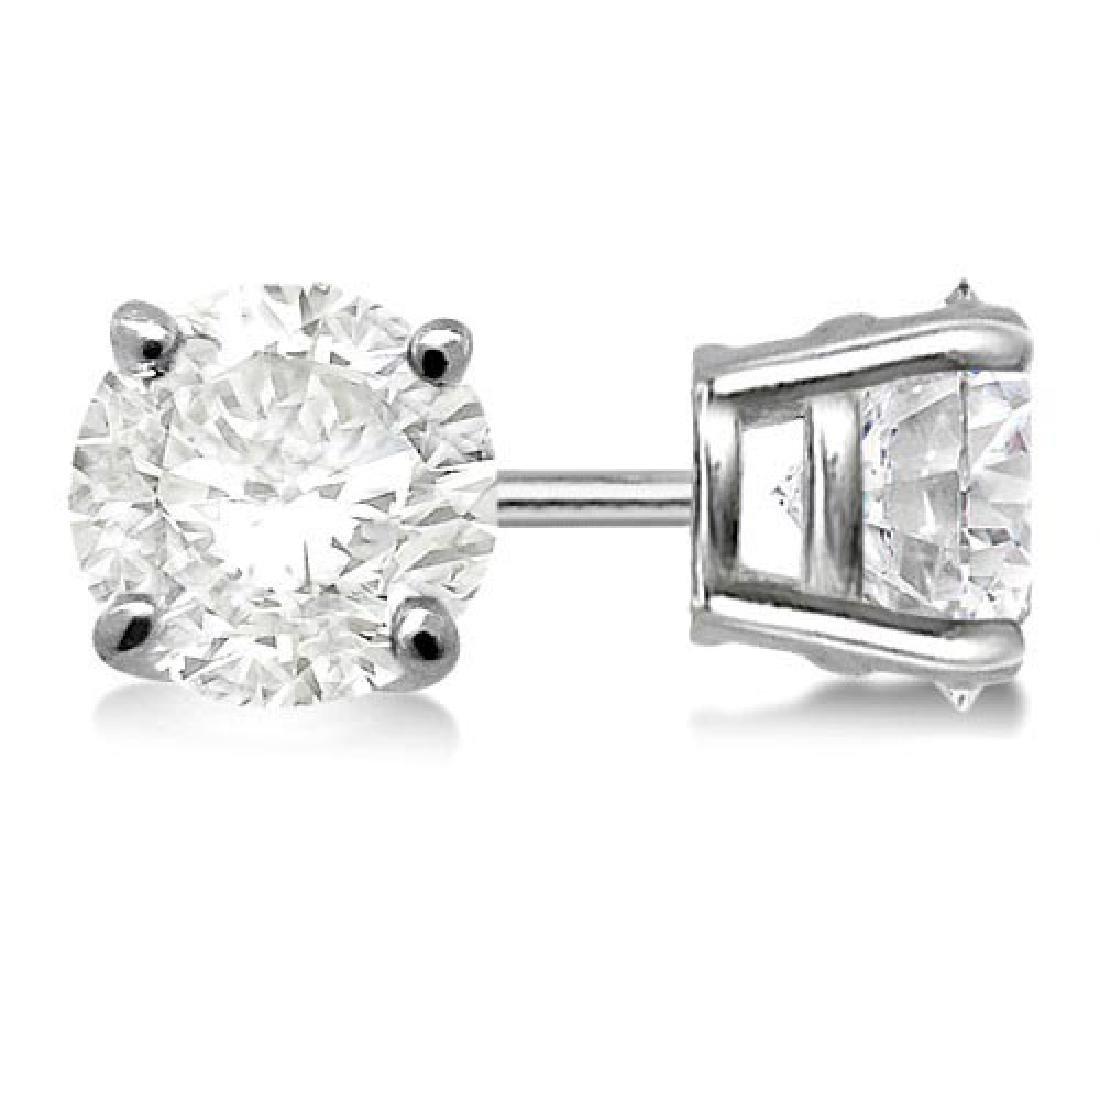 Certified 1.04 CTW Round Diamond Stud Earrings J/SI2